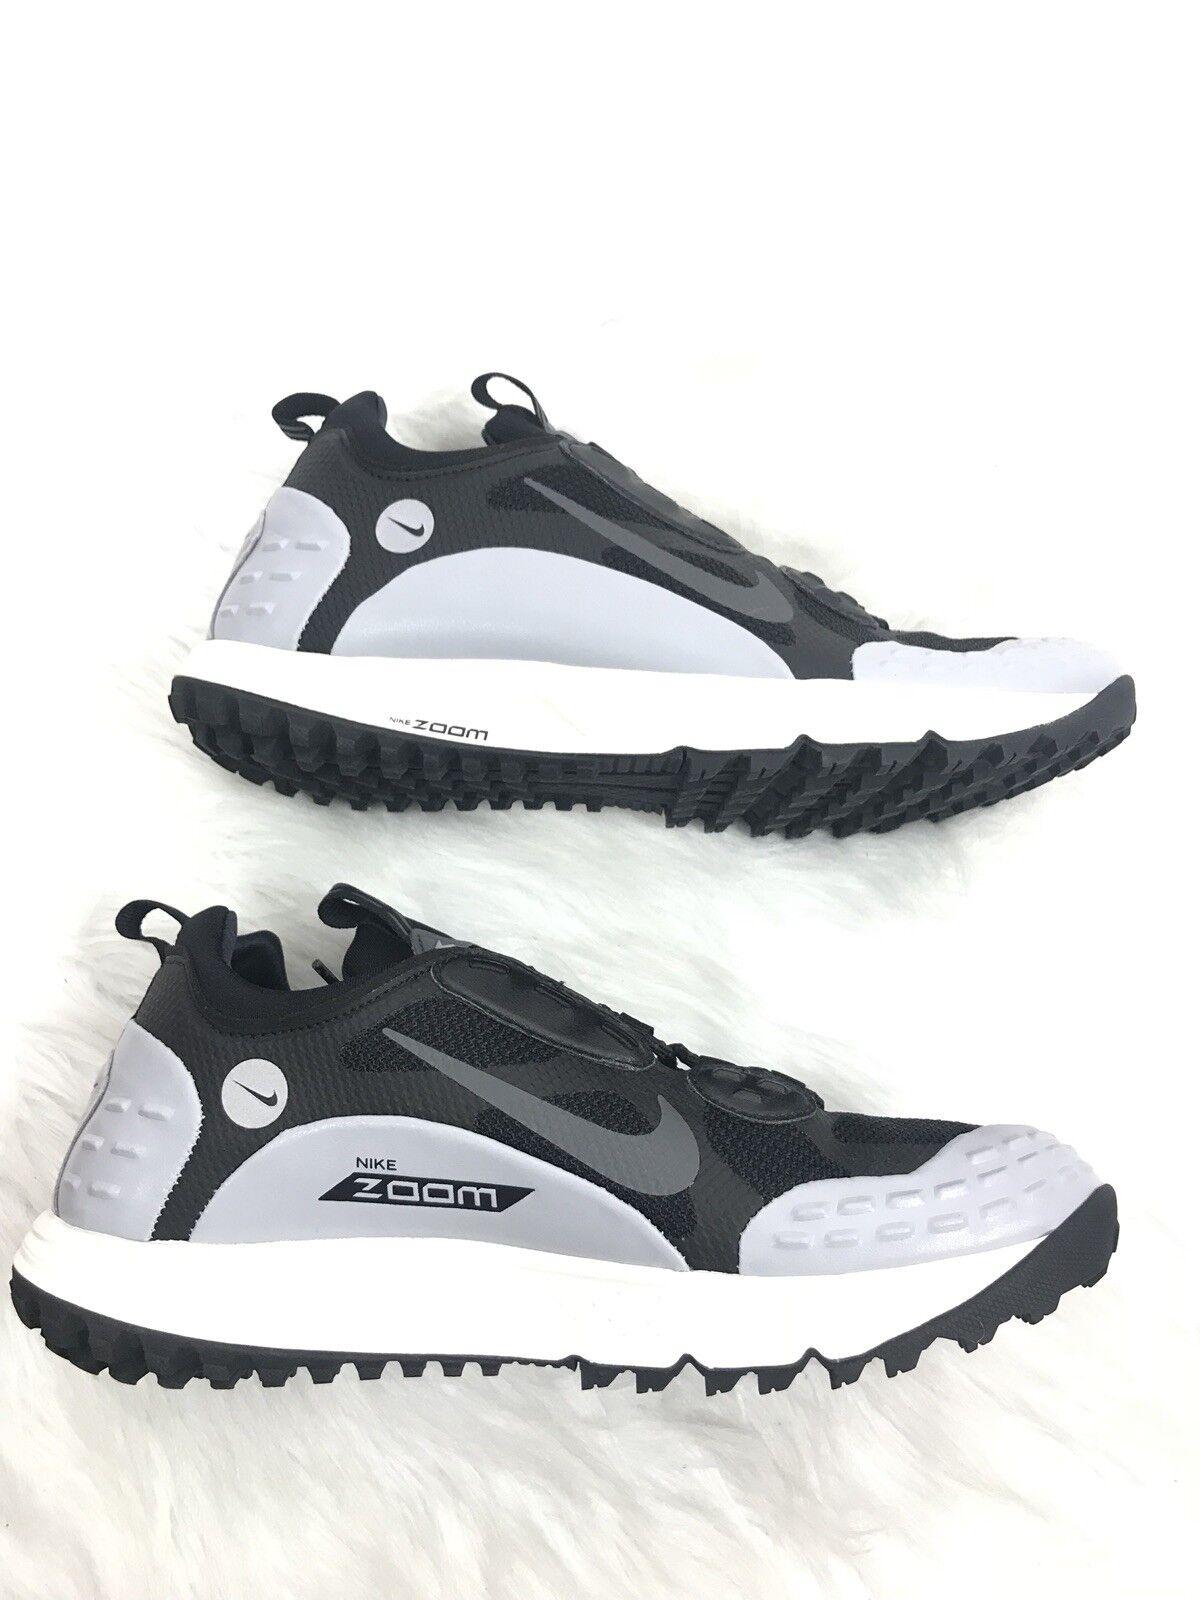 Nike Air Zoom Albis 16 Black Graphite Wolf Grey 904334-001 Size 11.5